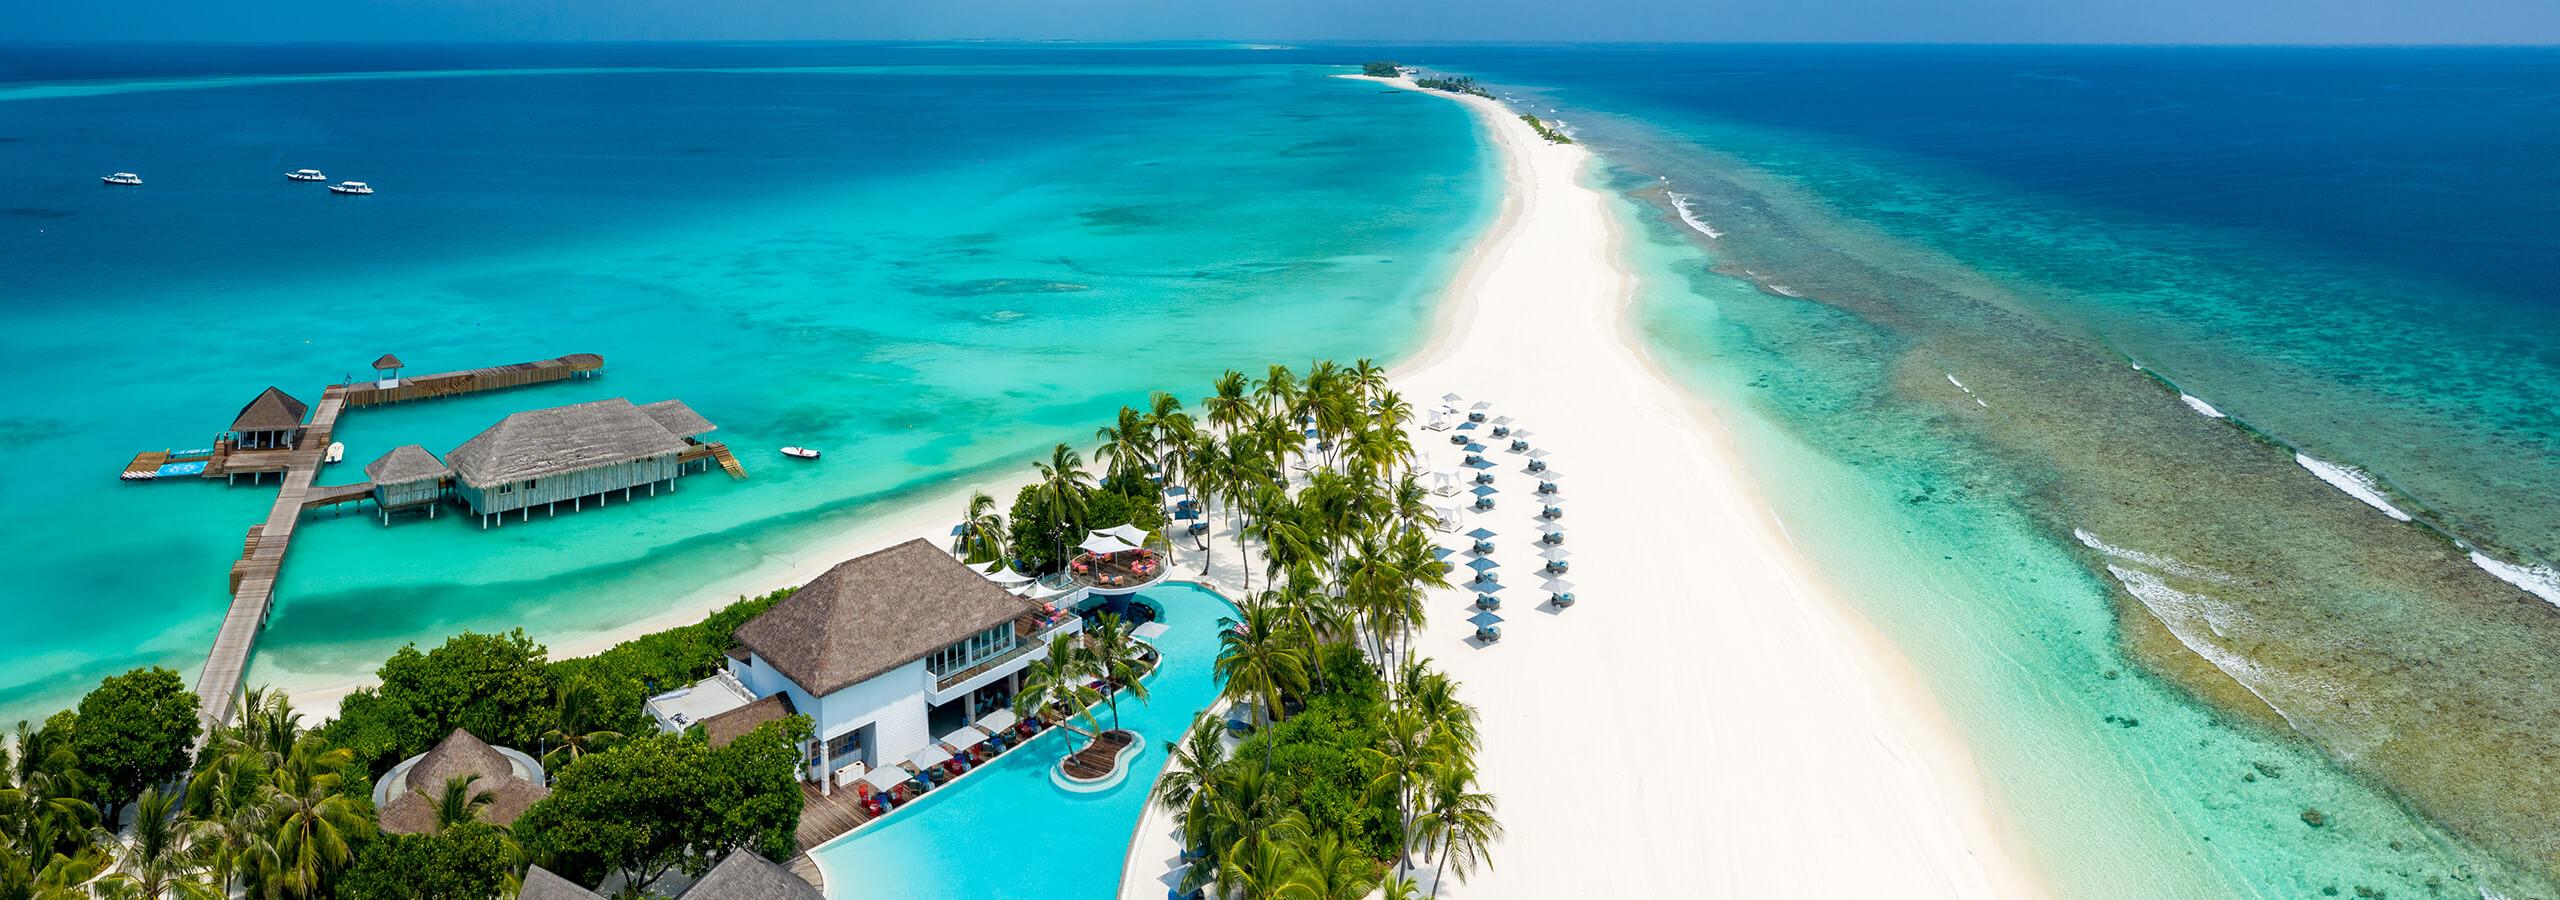 luxury-resort-maldives-seaside-collection-beach-bar-pool-sanbank